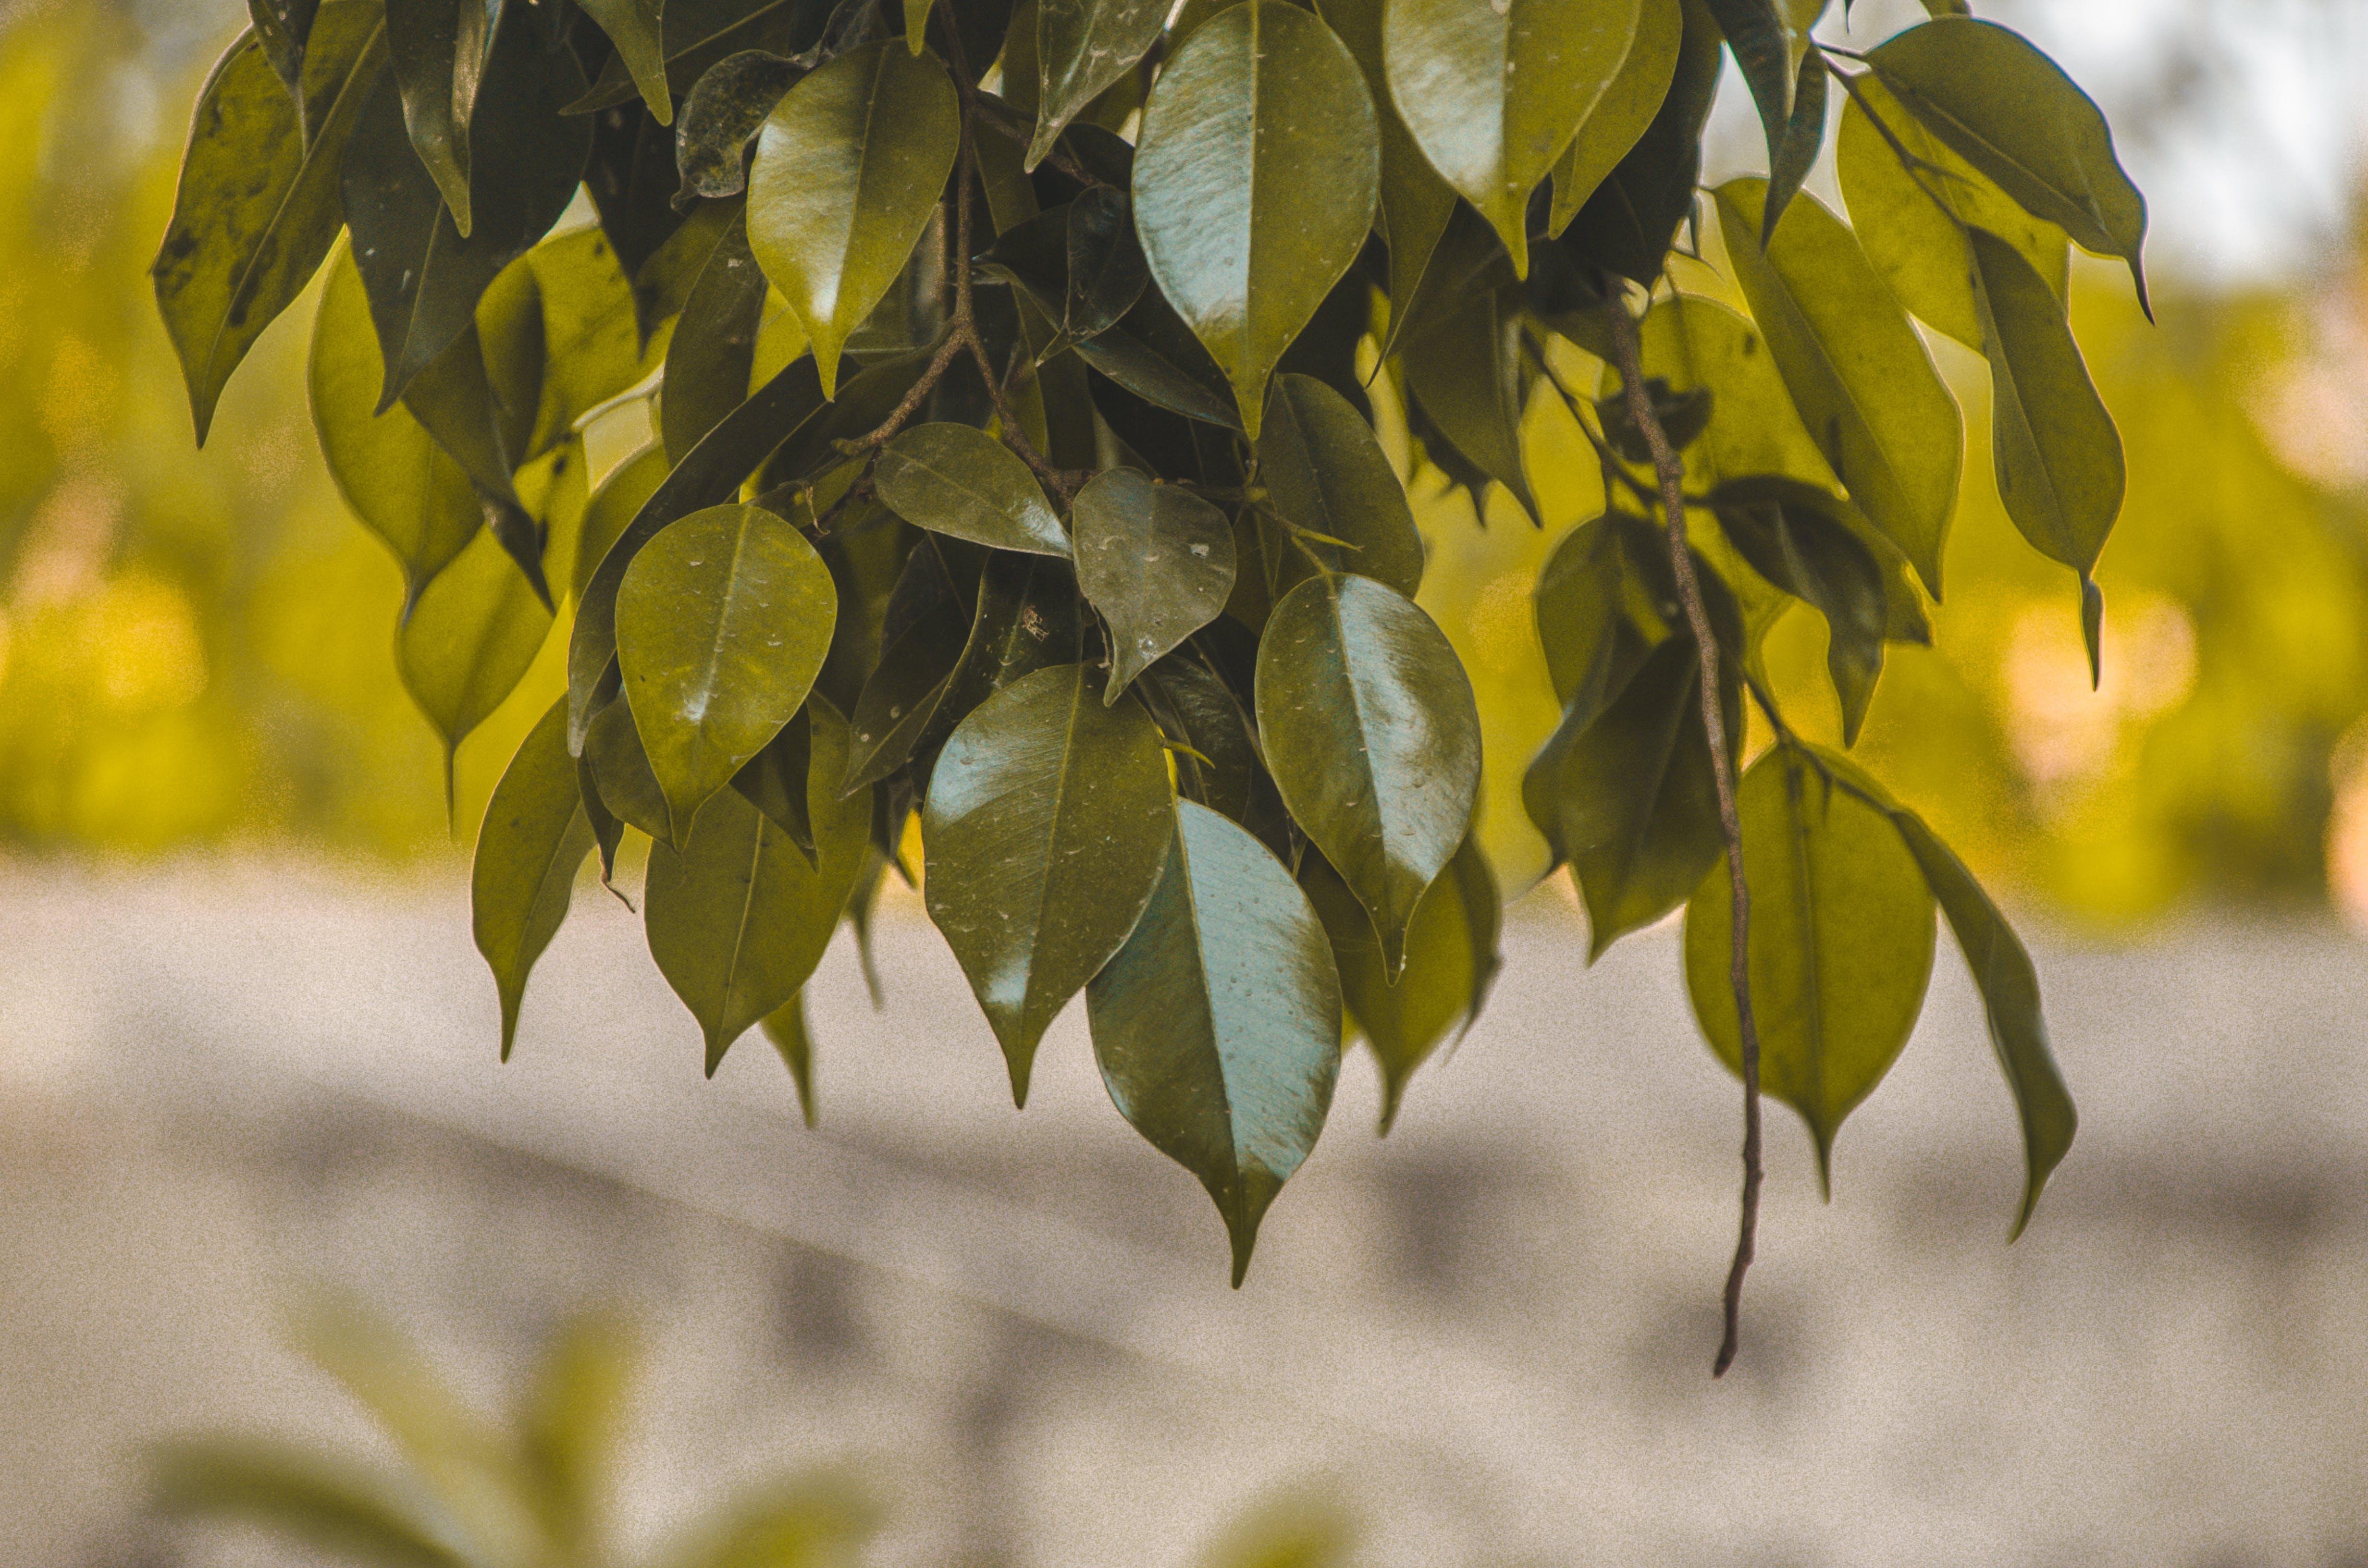 Kostenloses Stock Foto zu draussen, dunkelgrün, dunkelgrüne pflanzen, fotografie